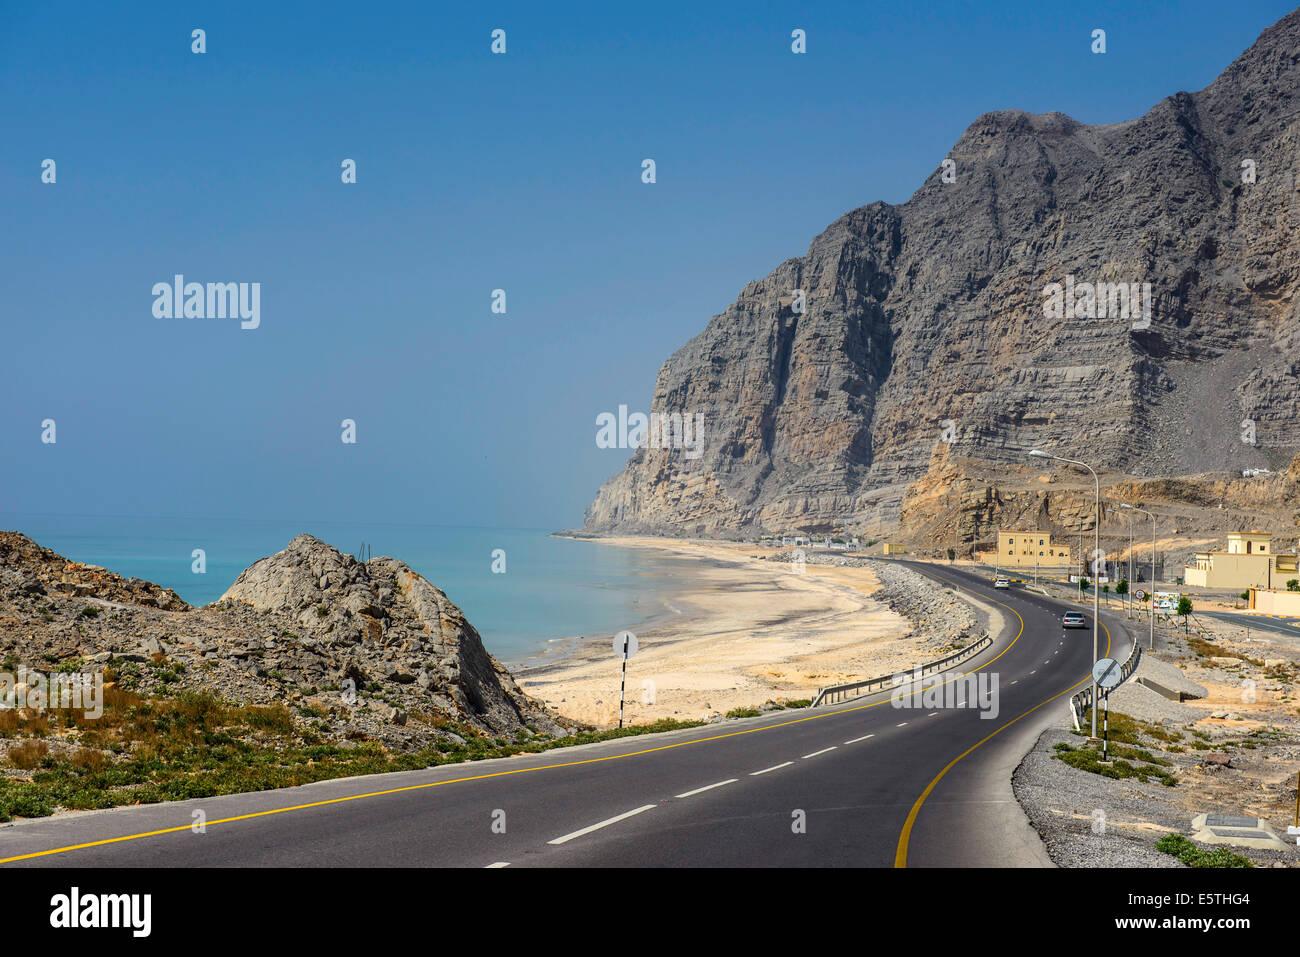 Khasab carretera costera, Musandam, Omán, Oriente Medio Imagen De Stock